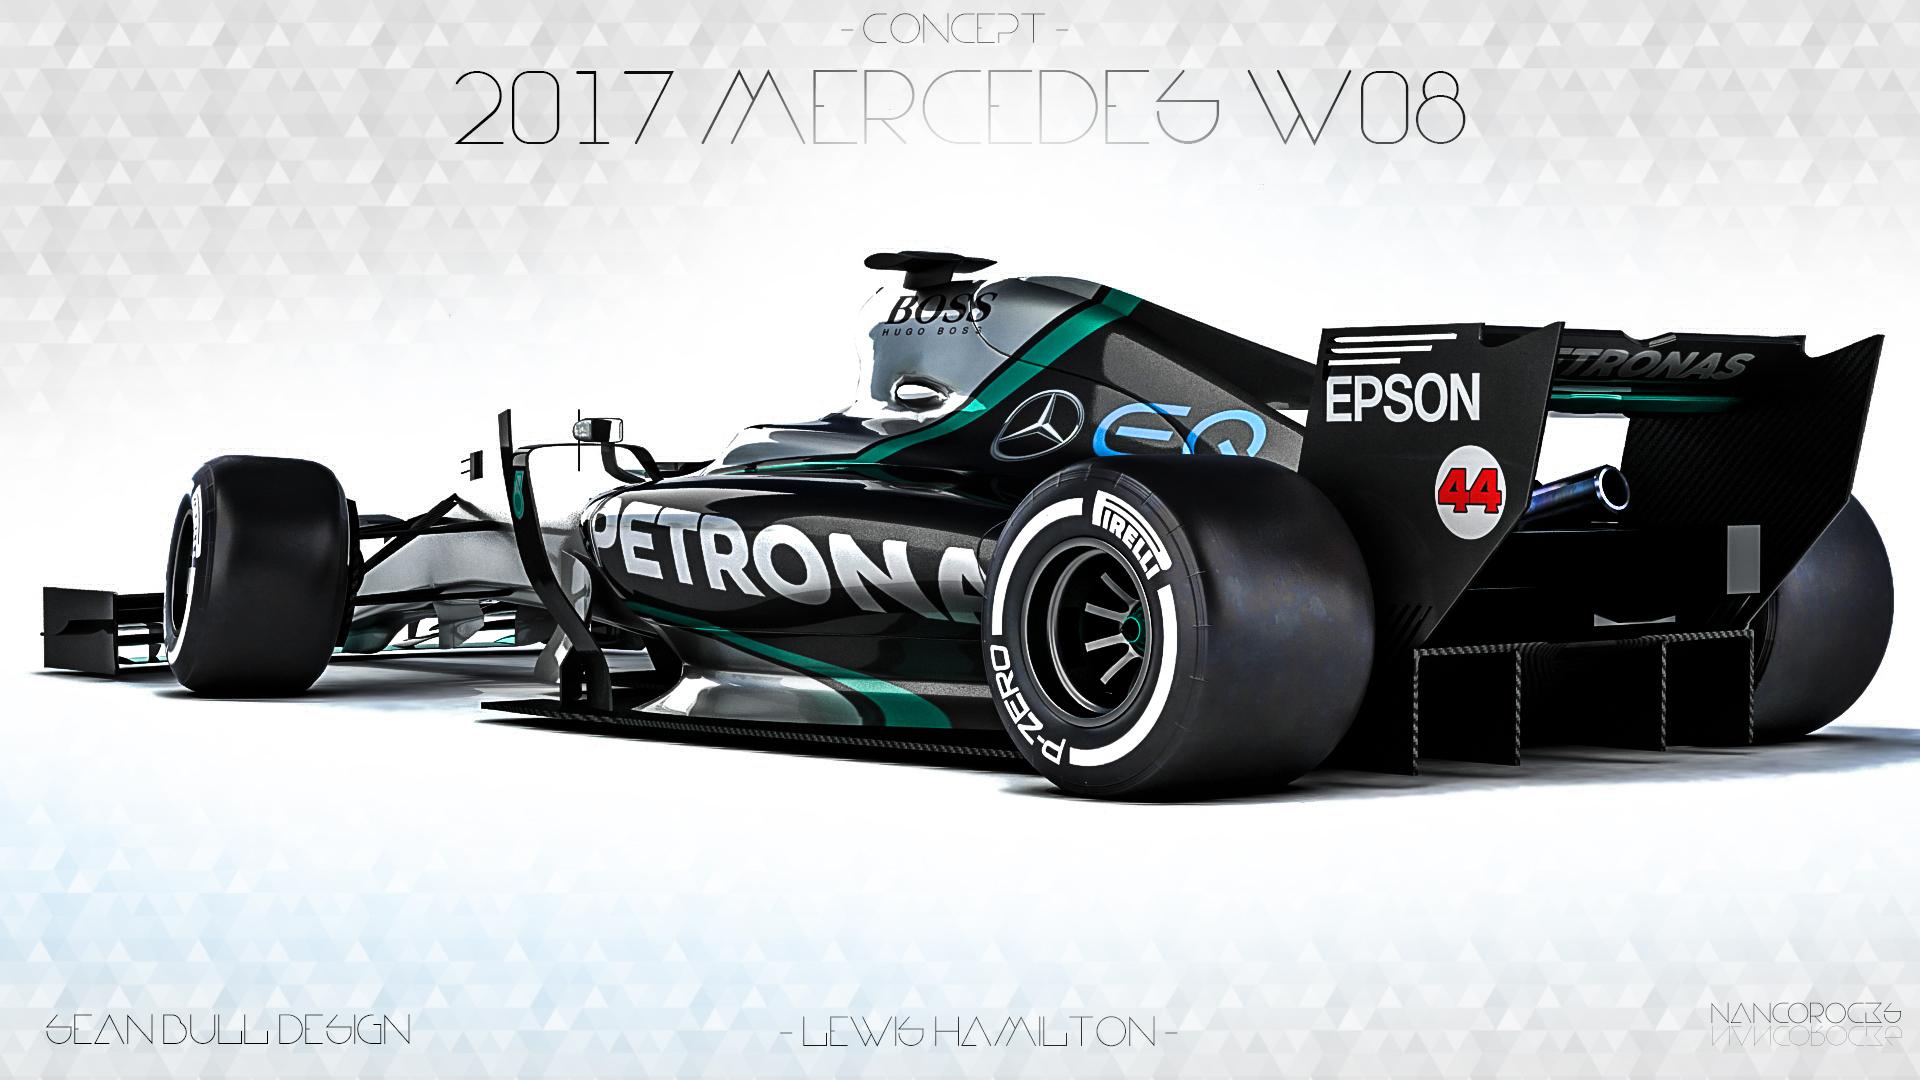 2017 Mercedes W08